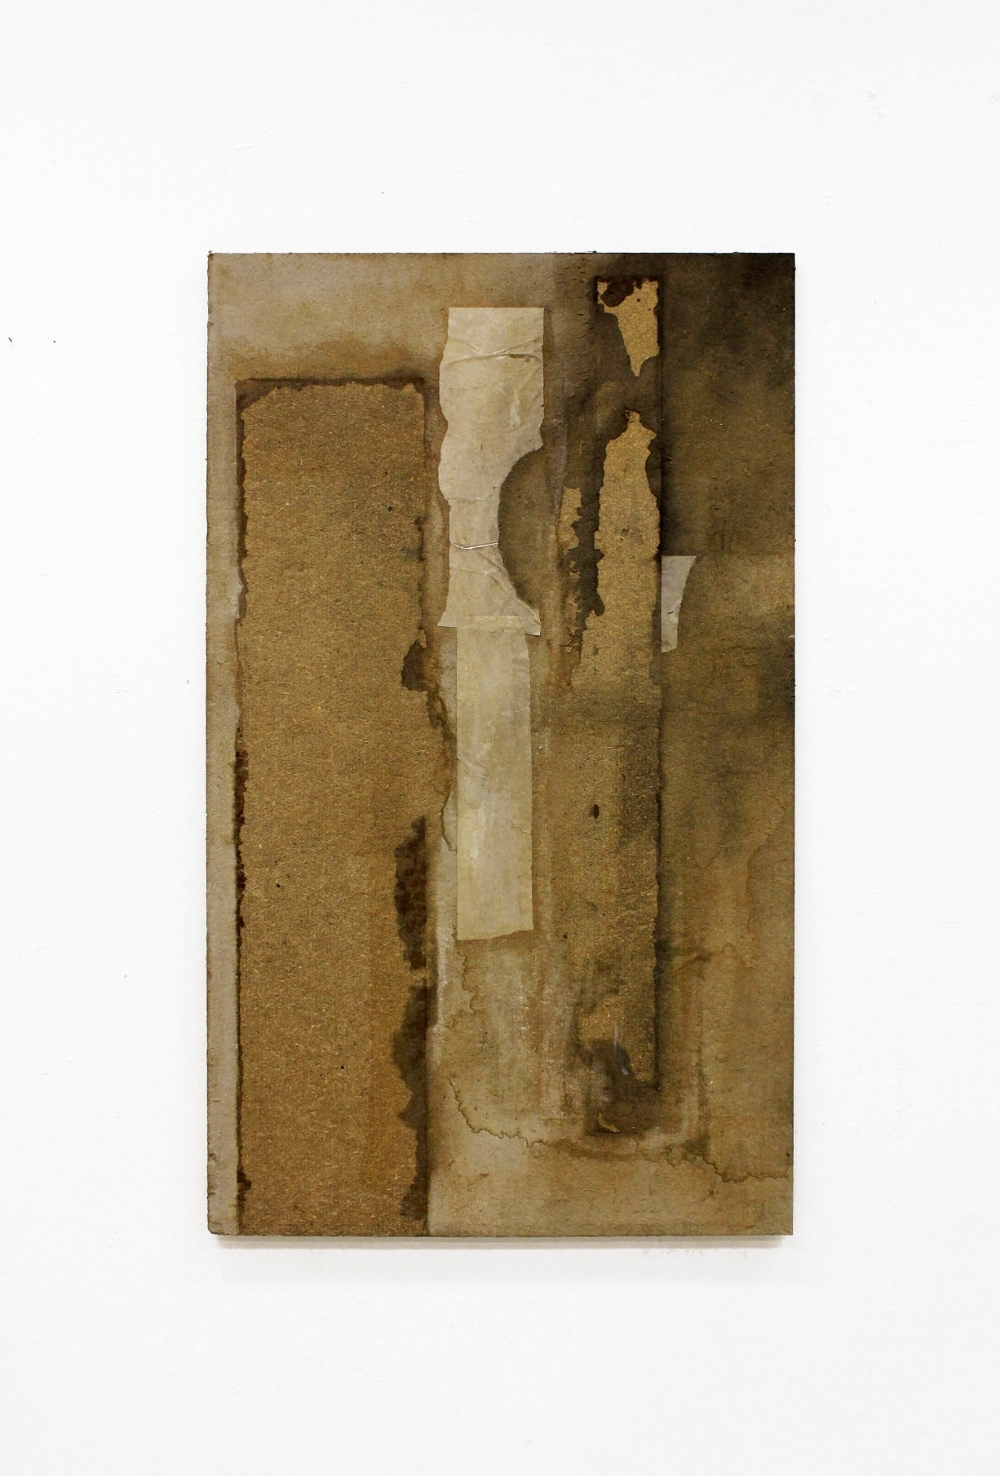 Untitled, 2015, Asphalt board, paper, acrylics, Cm. 89 x 59, Courtesy the Artist and Galerie Antoine Levi, Paris